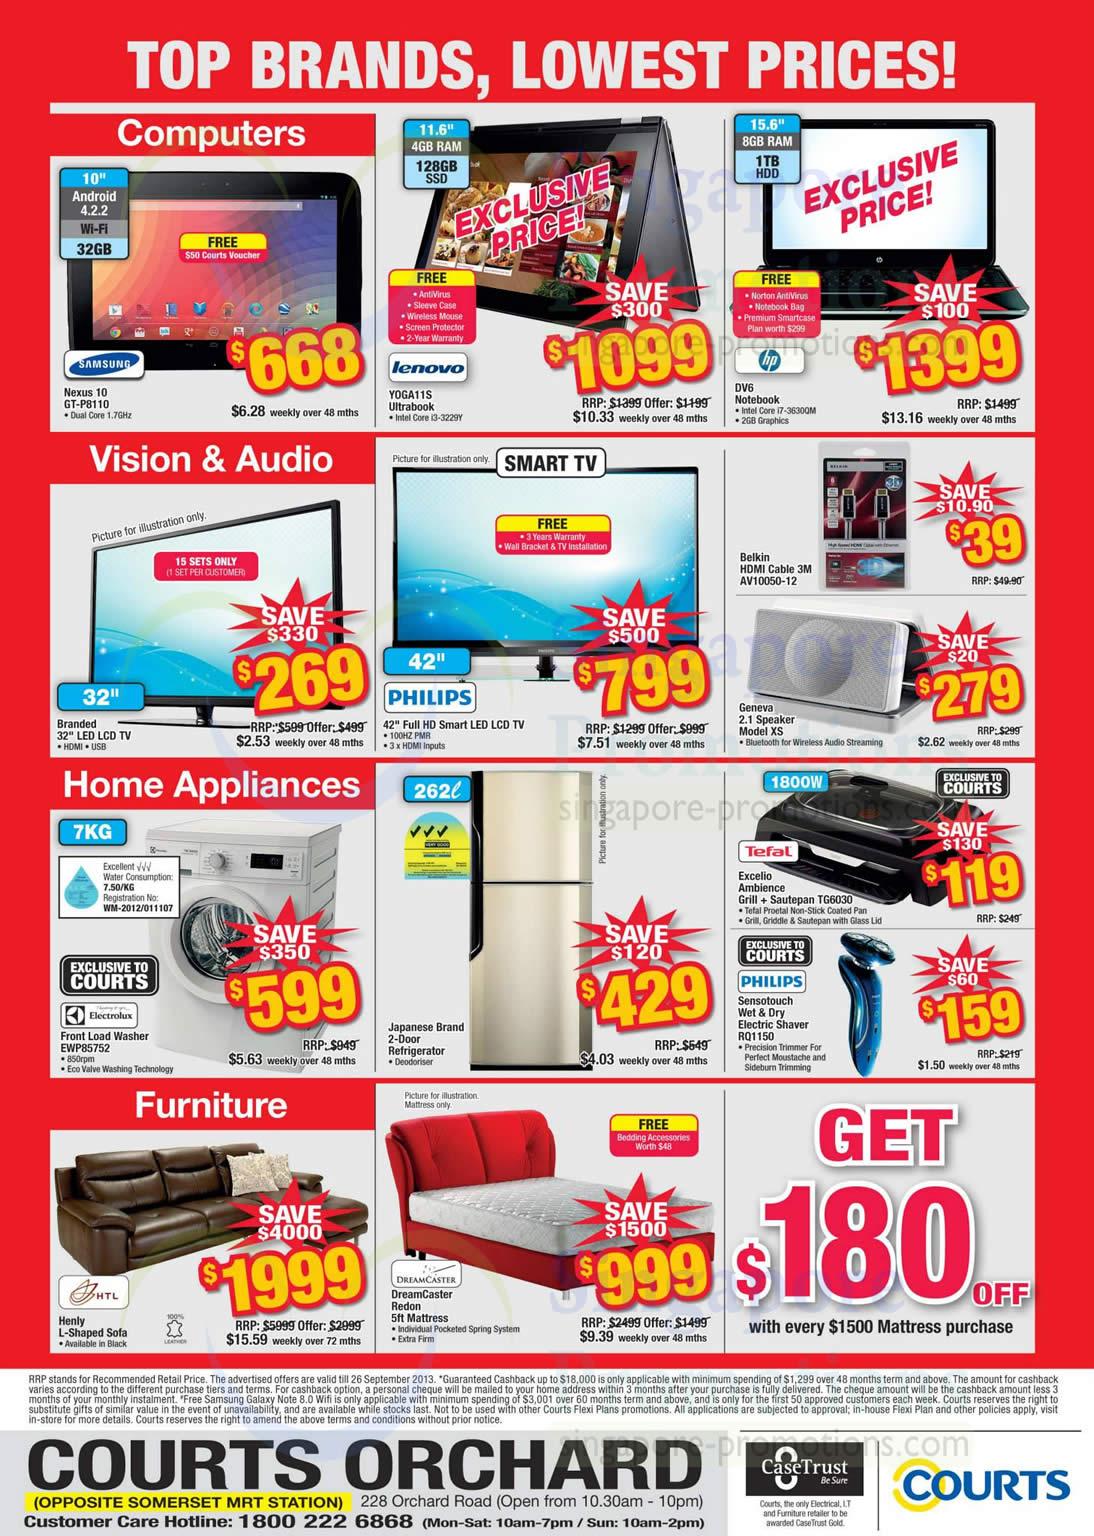 Tablets, Computers, Appliances, Furniture